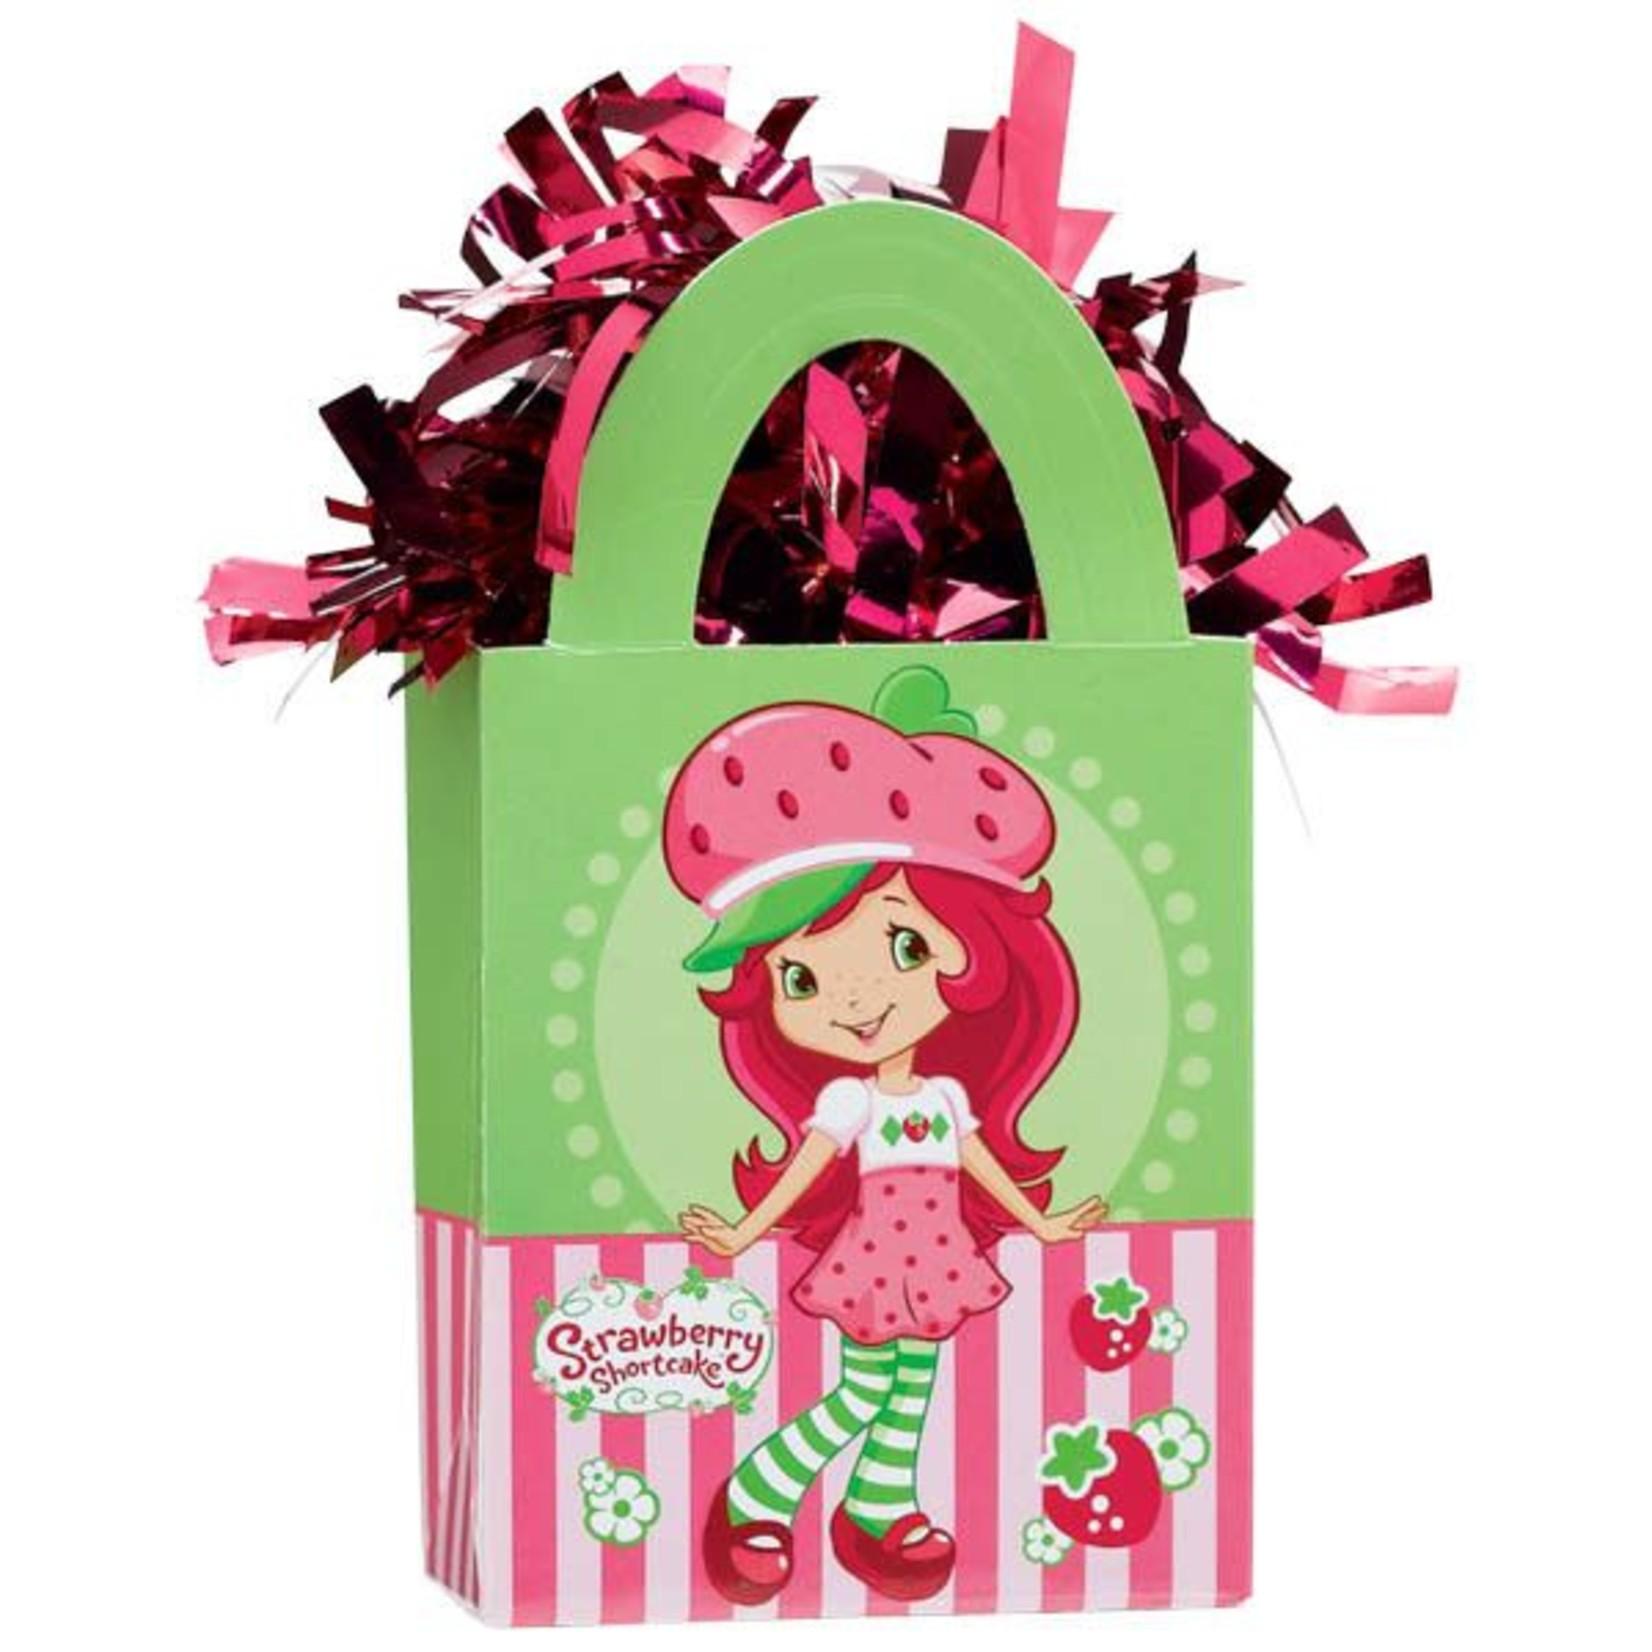 Balloon Weight-Strawberry Shortcake